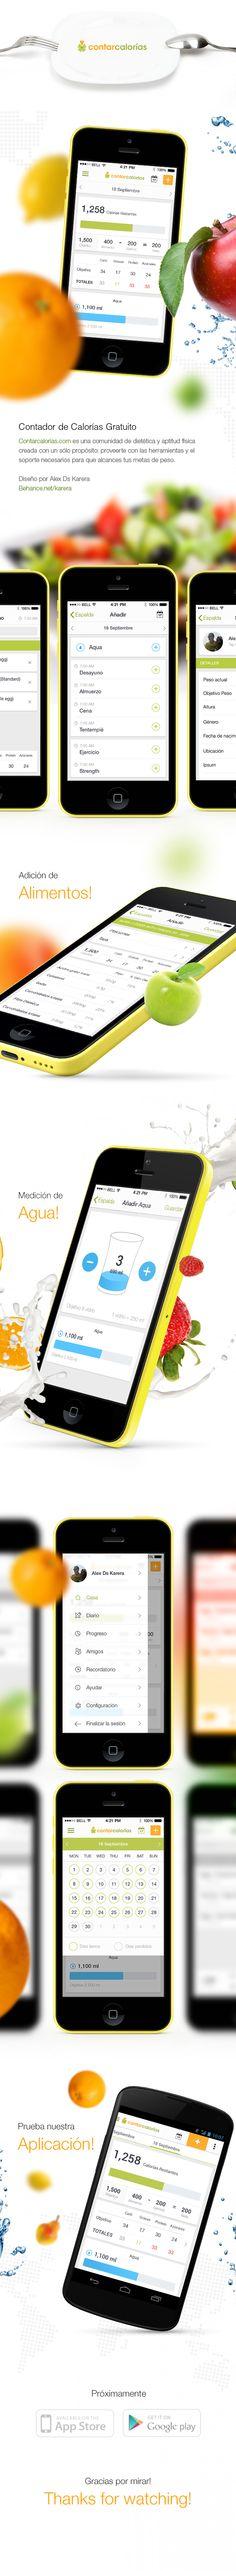 Contar calorias. Fitness application (iOS & Android) by Alex Ds Karera, via Behance Mobile Ui Design, App Design, Food Design, Tablet Ui, Iphone, Ui Inspiration, User Interface Design, Apps, Fun Workouts